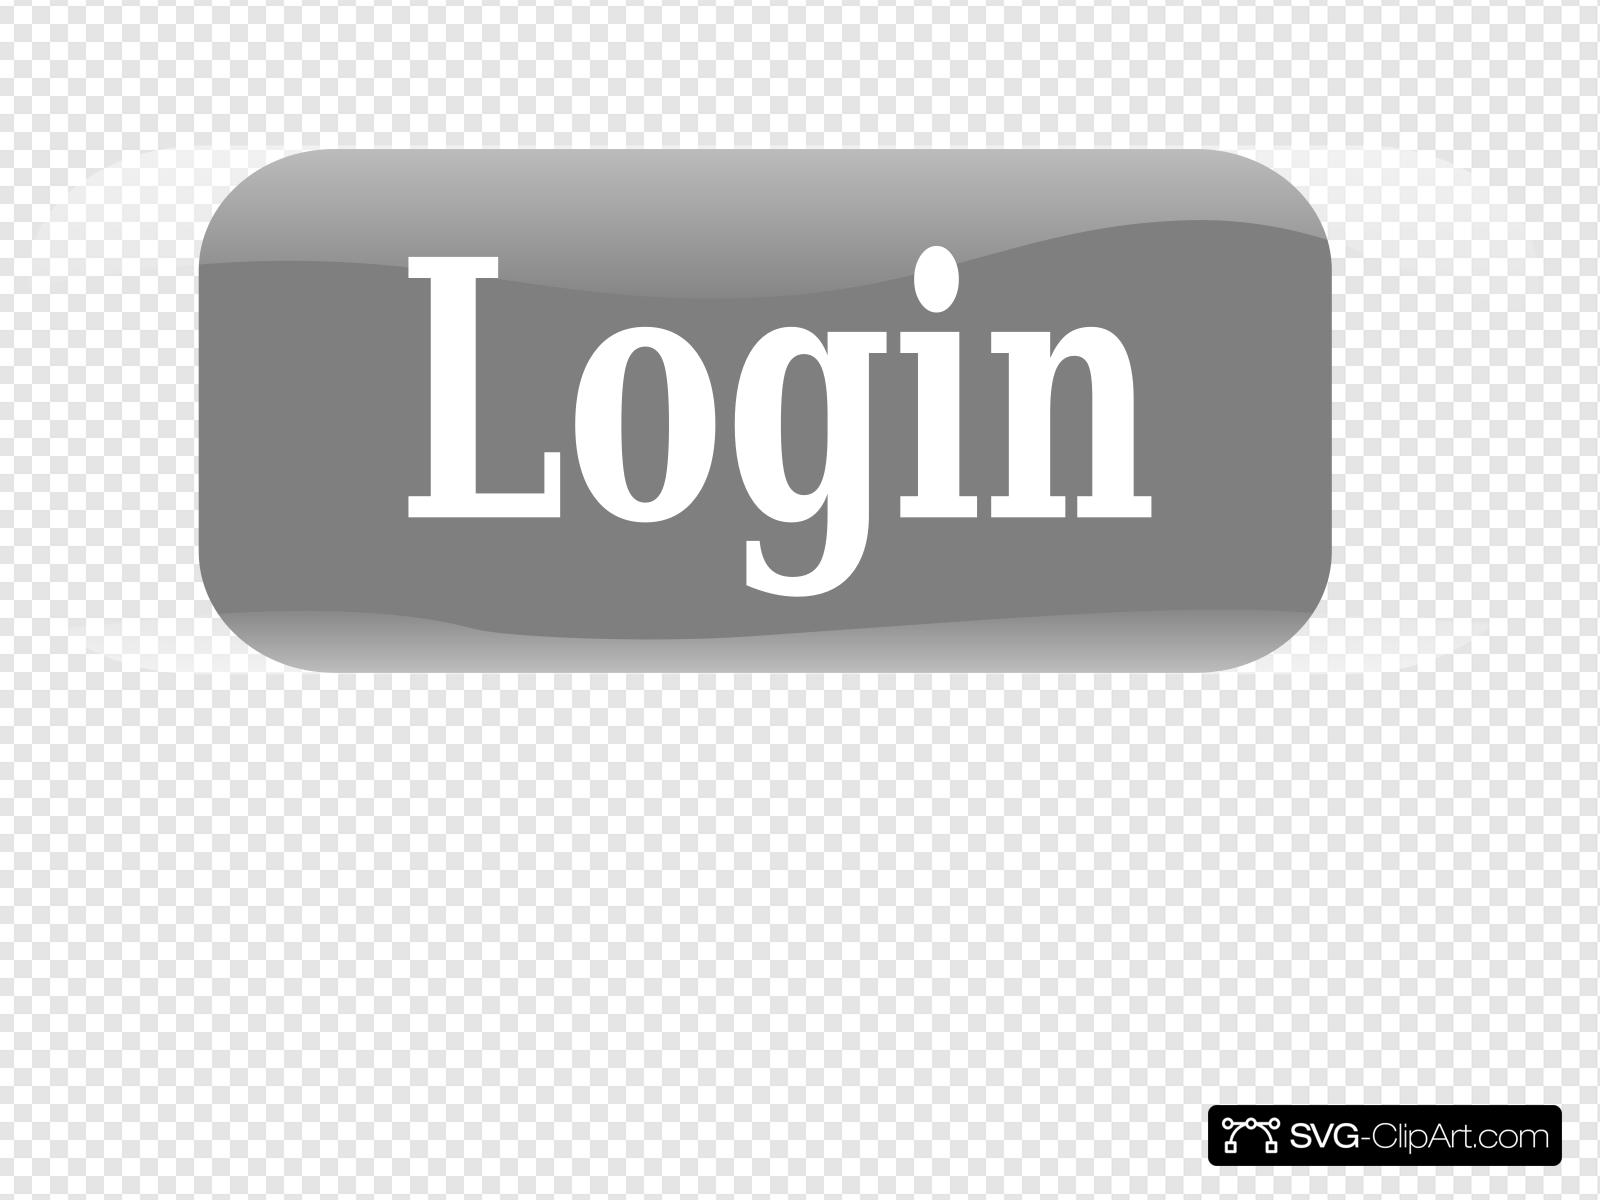 New Login Button Clip art, Icon and SVG.